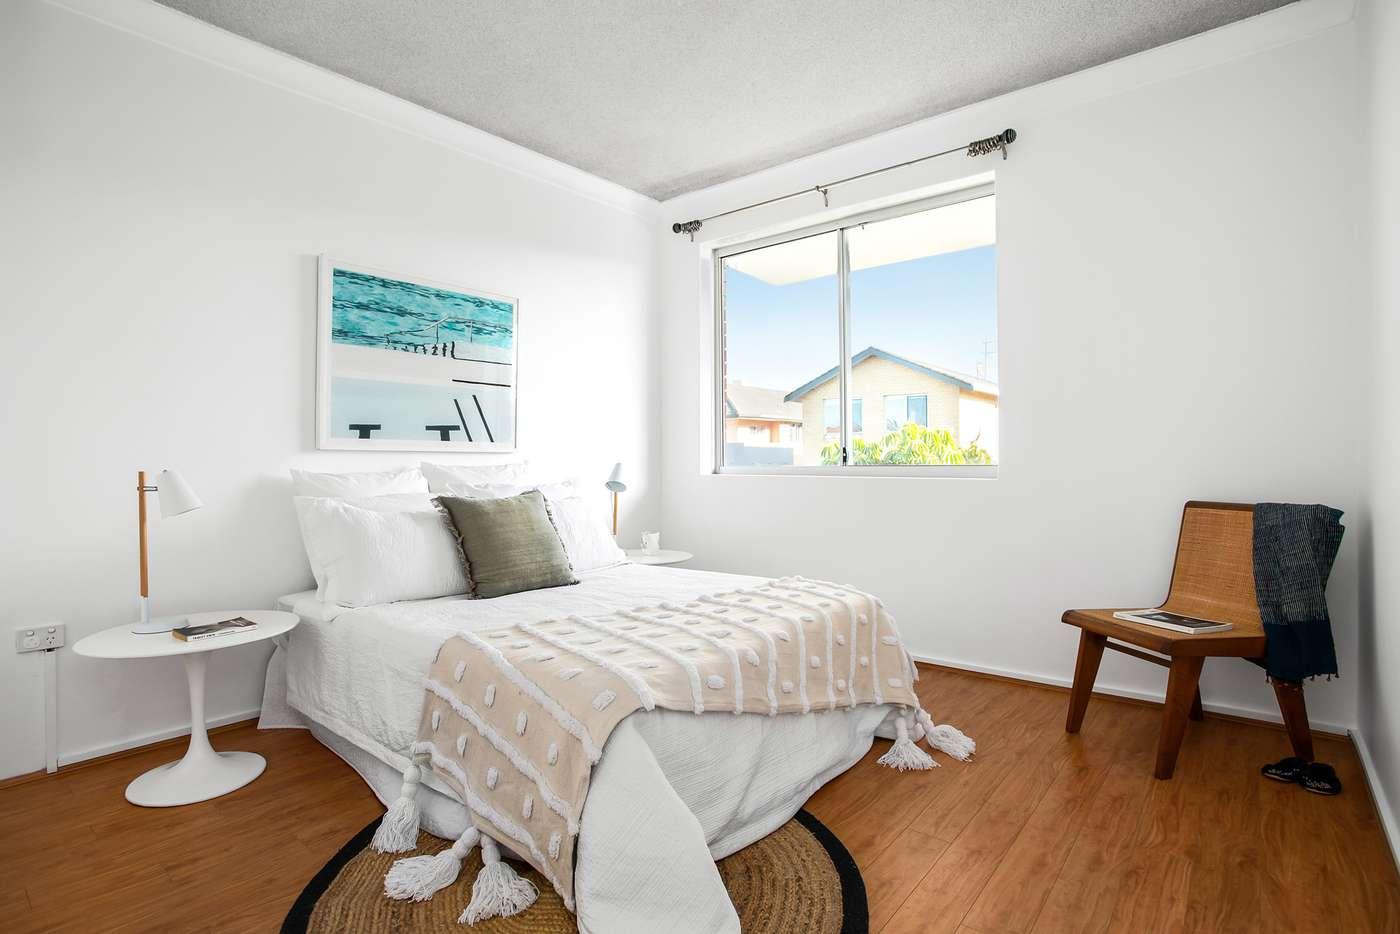 Sixth view of Homely apartment listing, 6/30 Beach Road, Bondi Beach NSW 2026